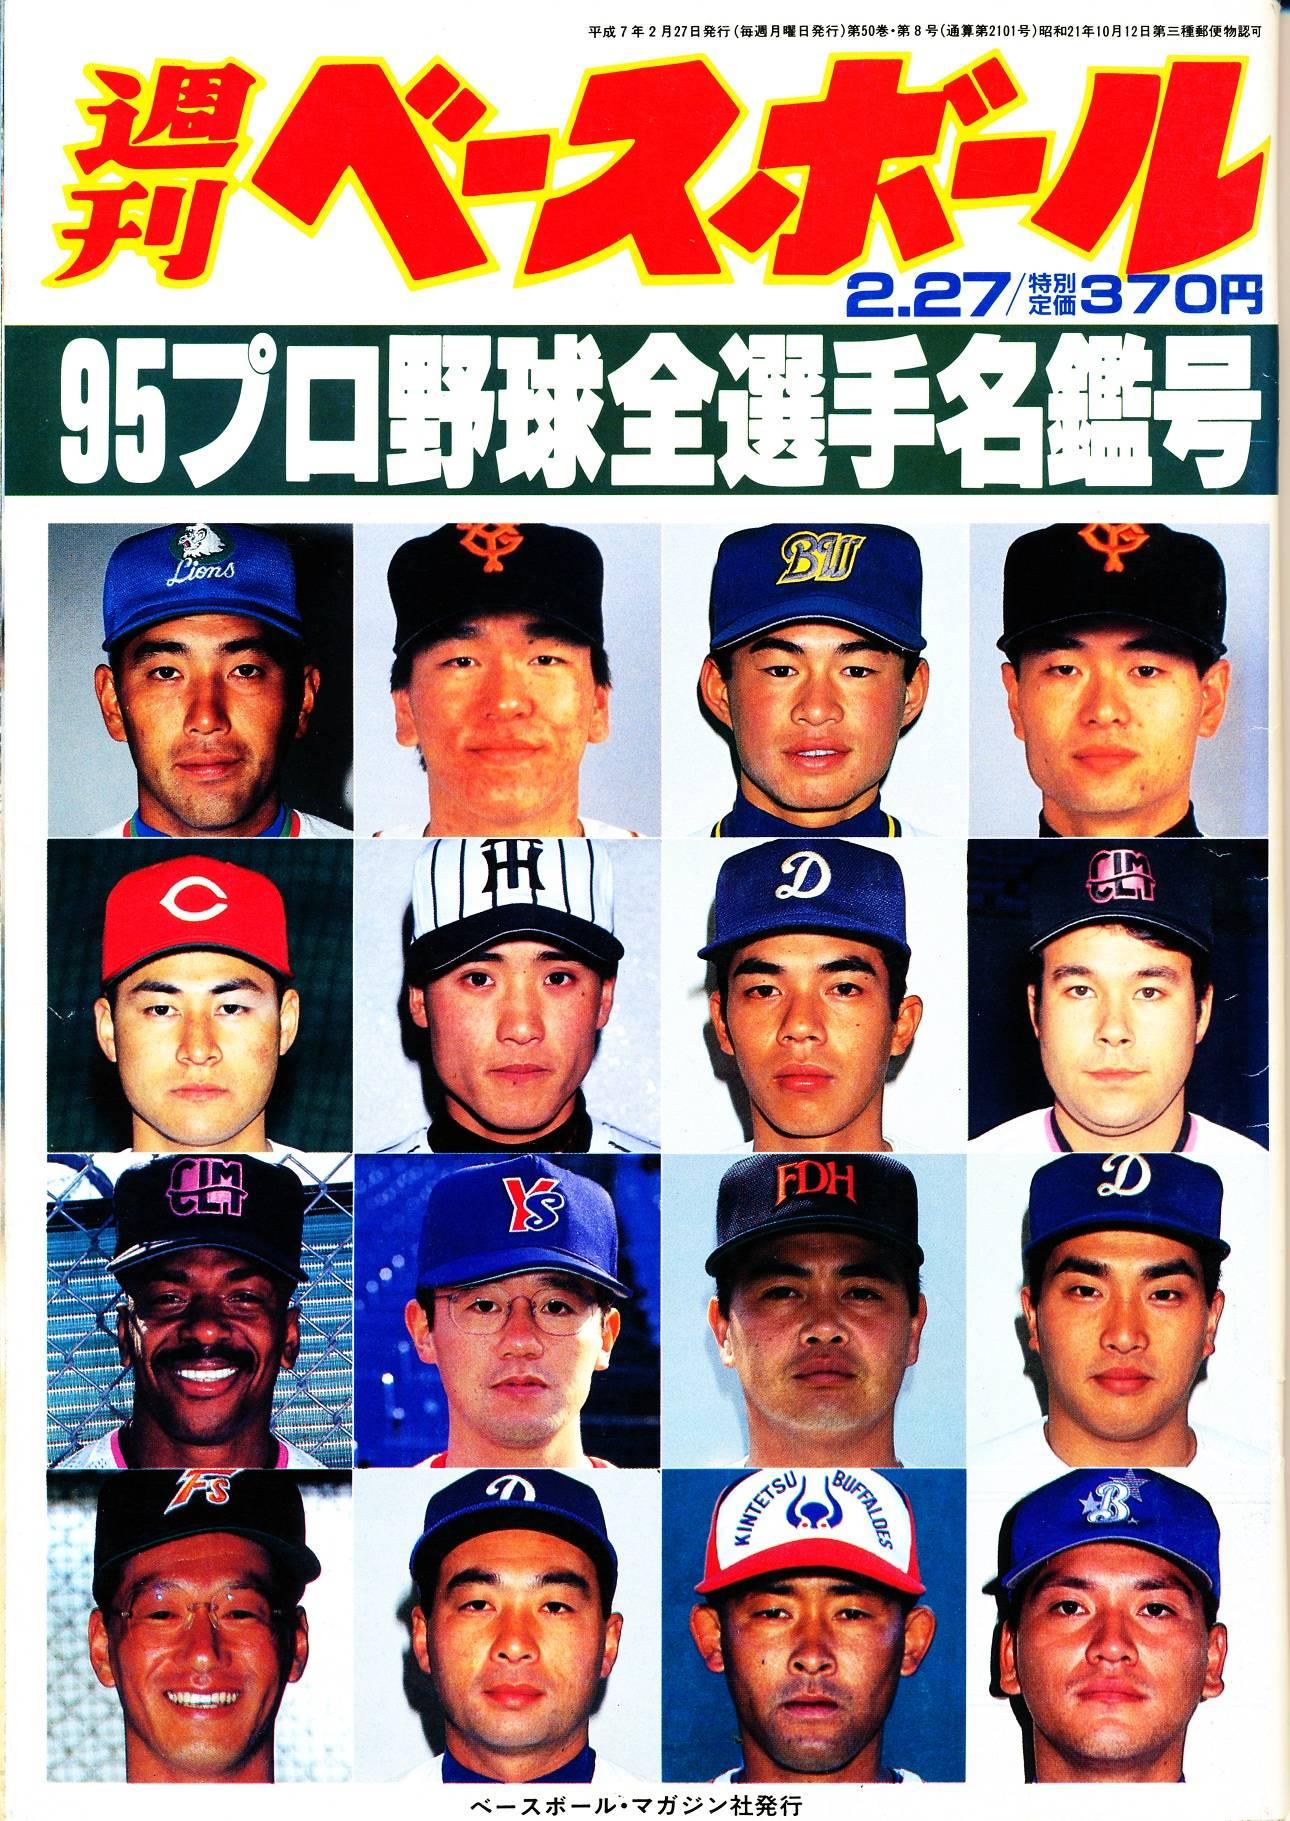 Images of 1990年-1991年のJSL - JapaneseClass.jp